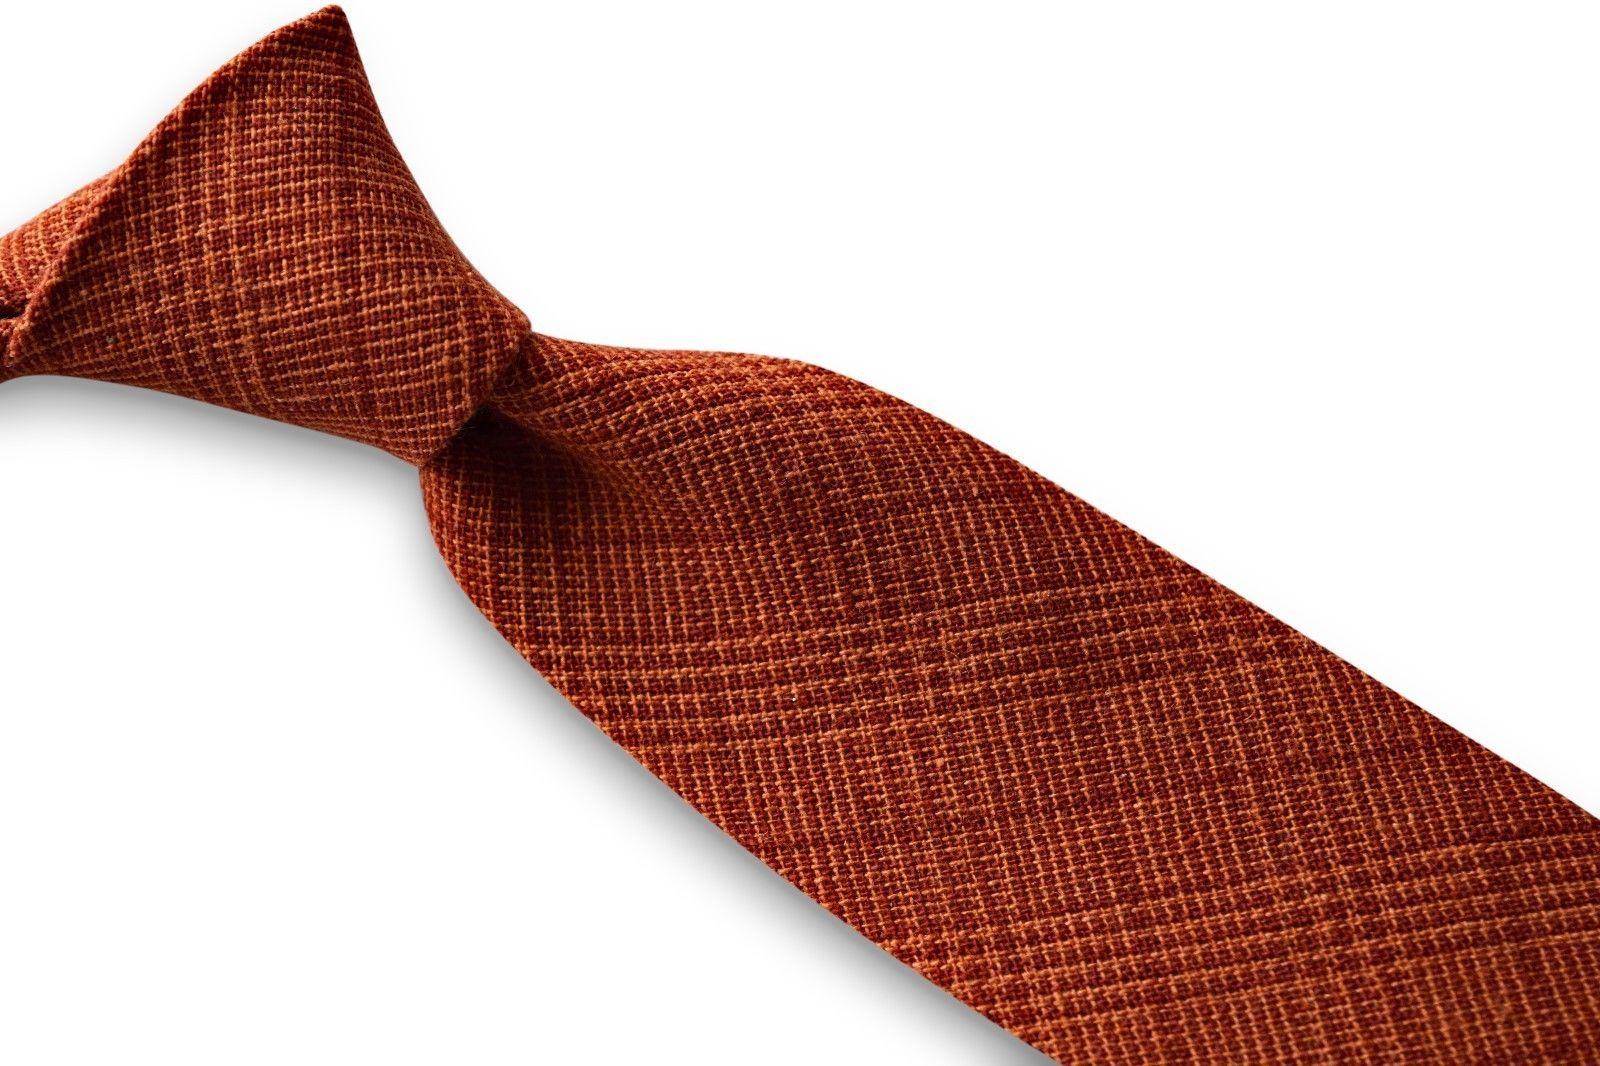 Frederick Thomas arancione e Scozzese Rosso MENS 100% LINO CRAVATTA ft3368